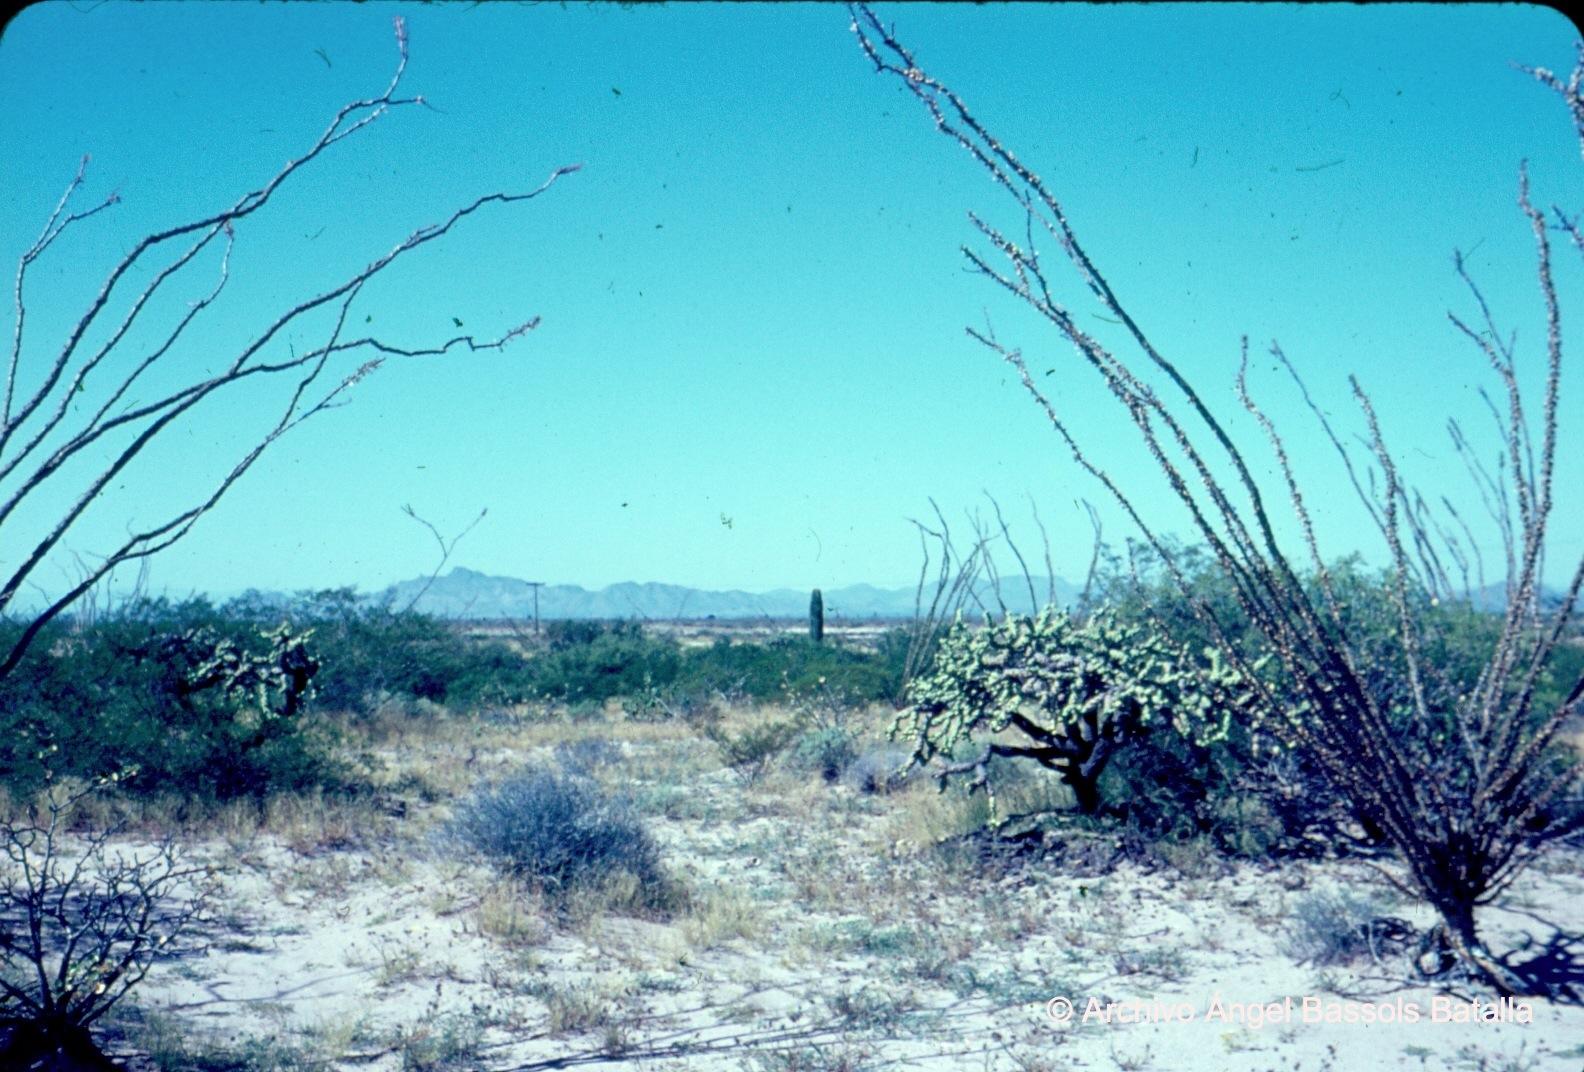 Vegetación cerca de Bahía Kino